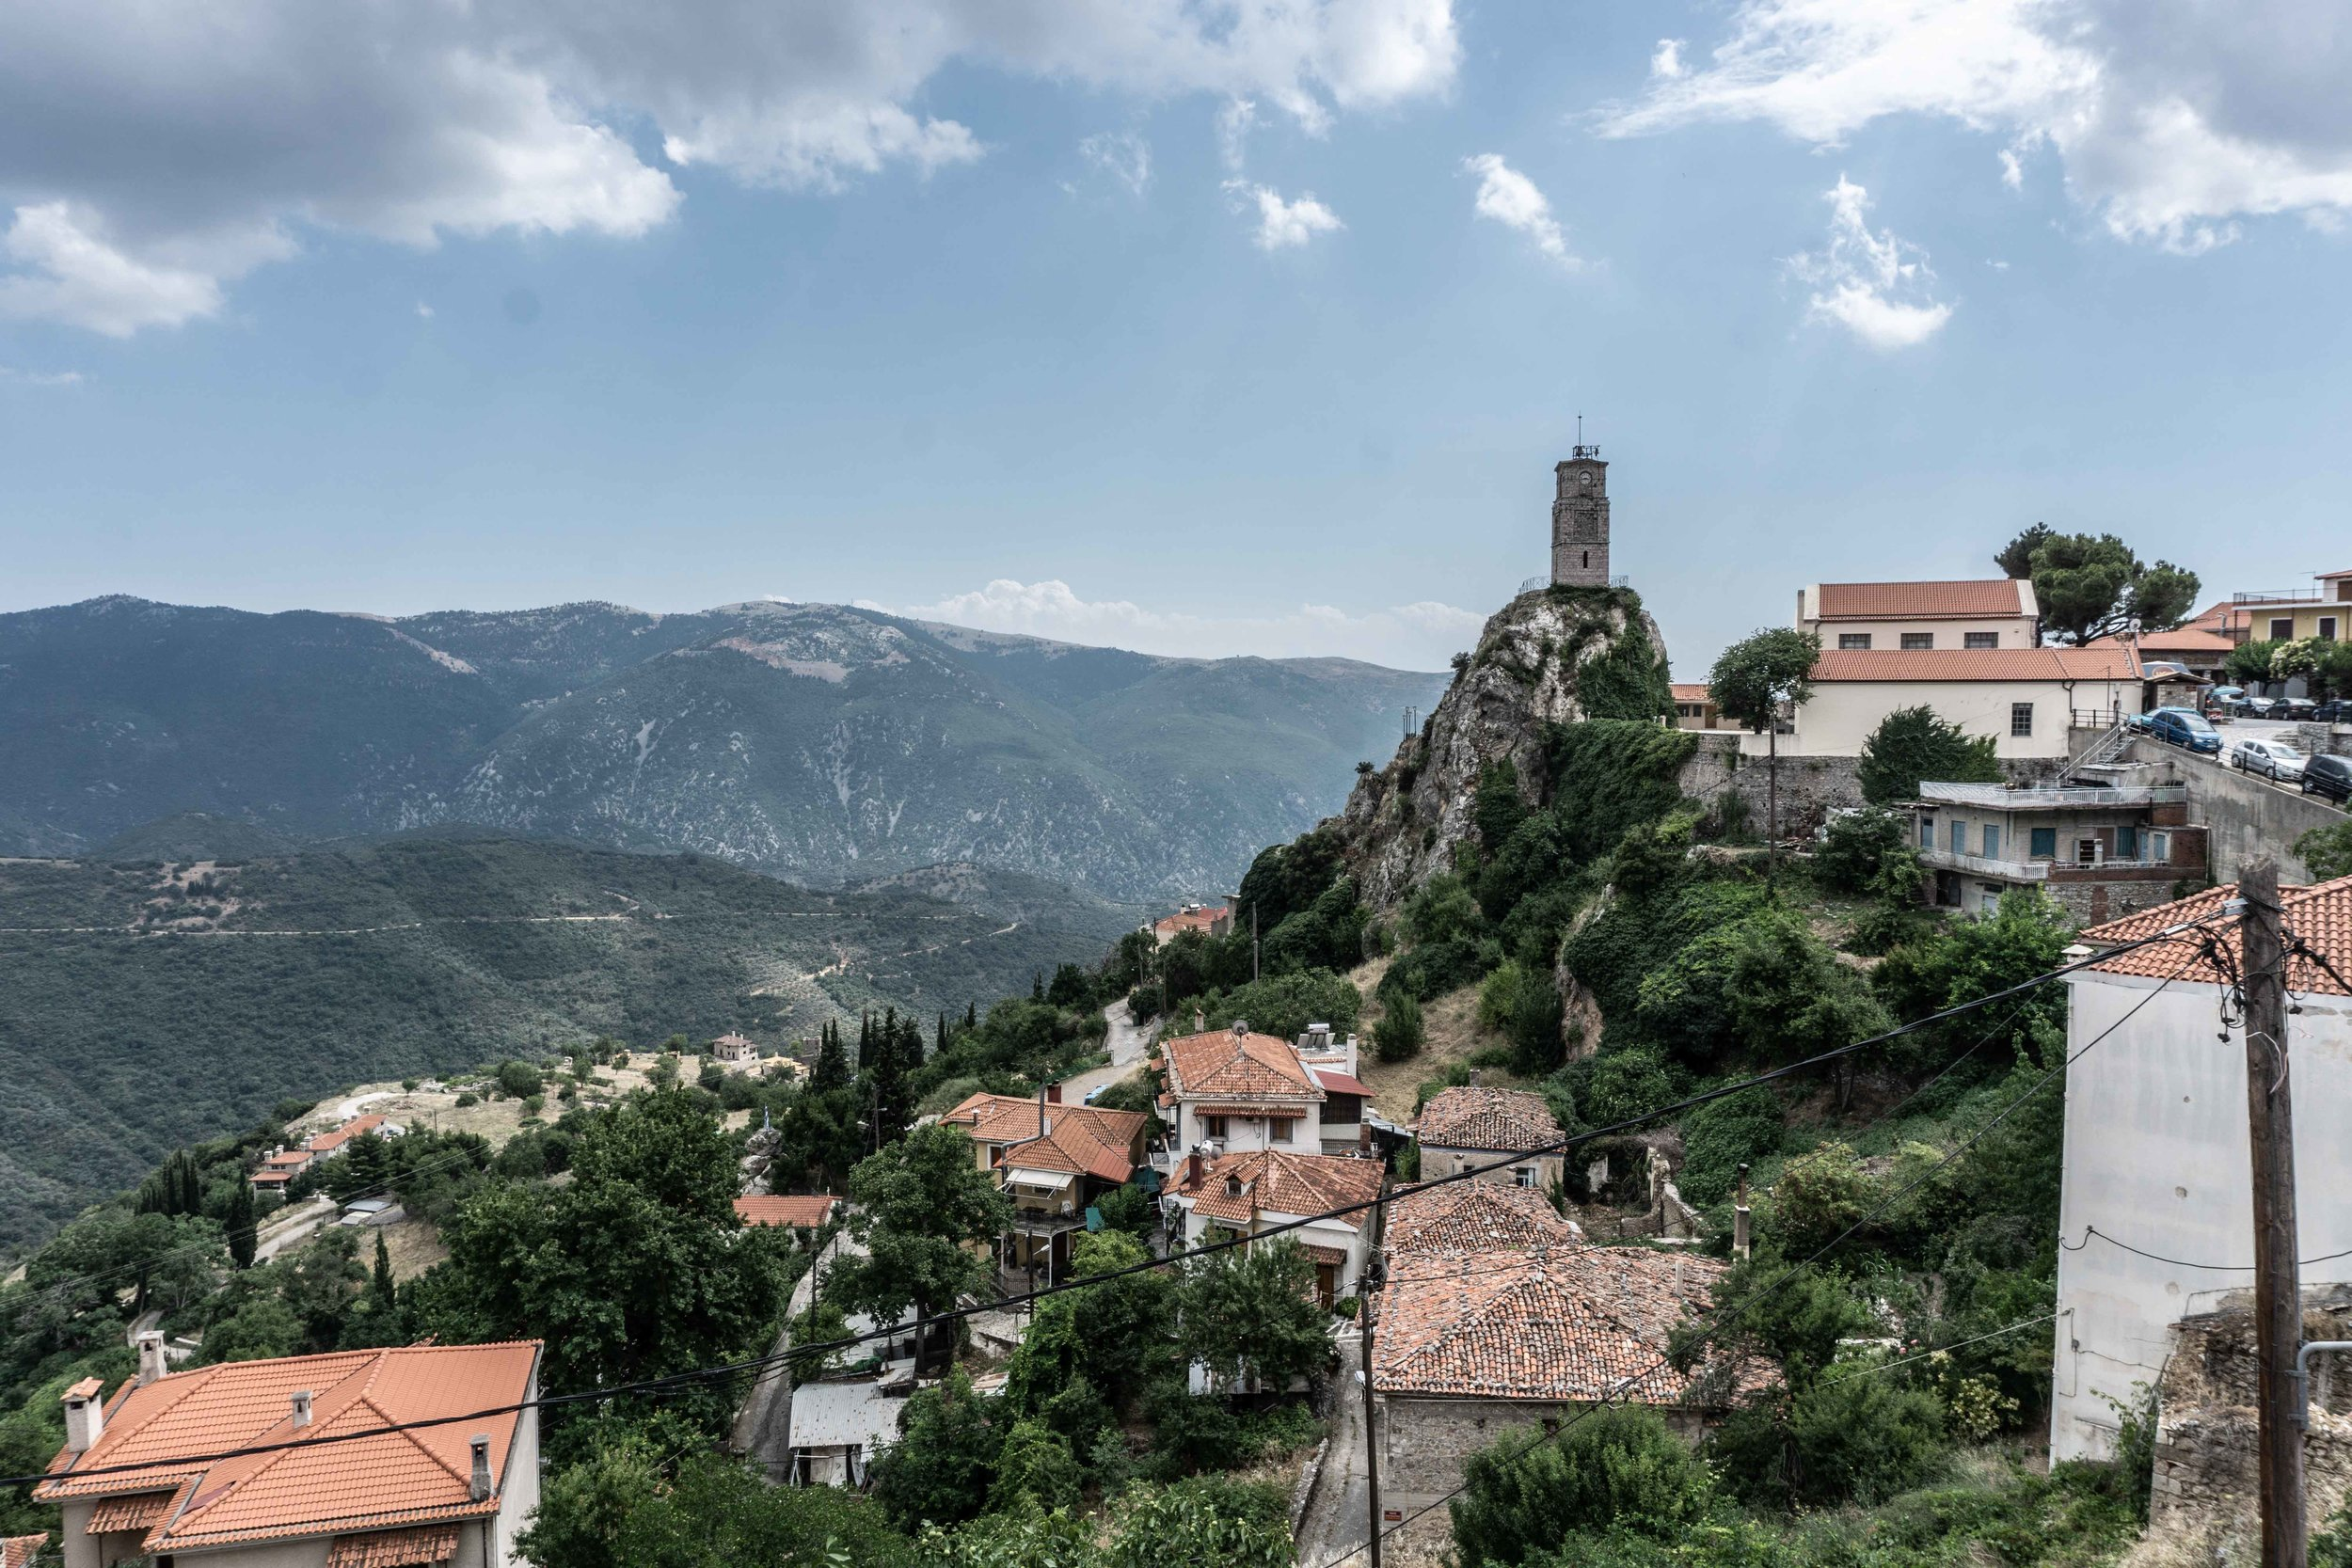 Little mountain towns